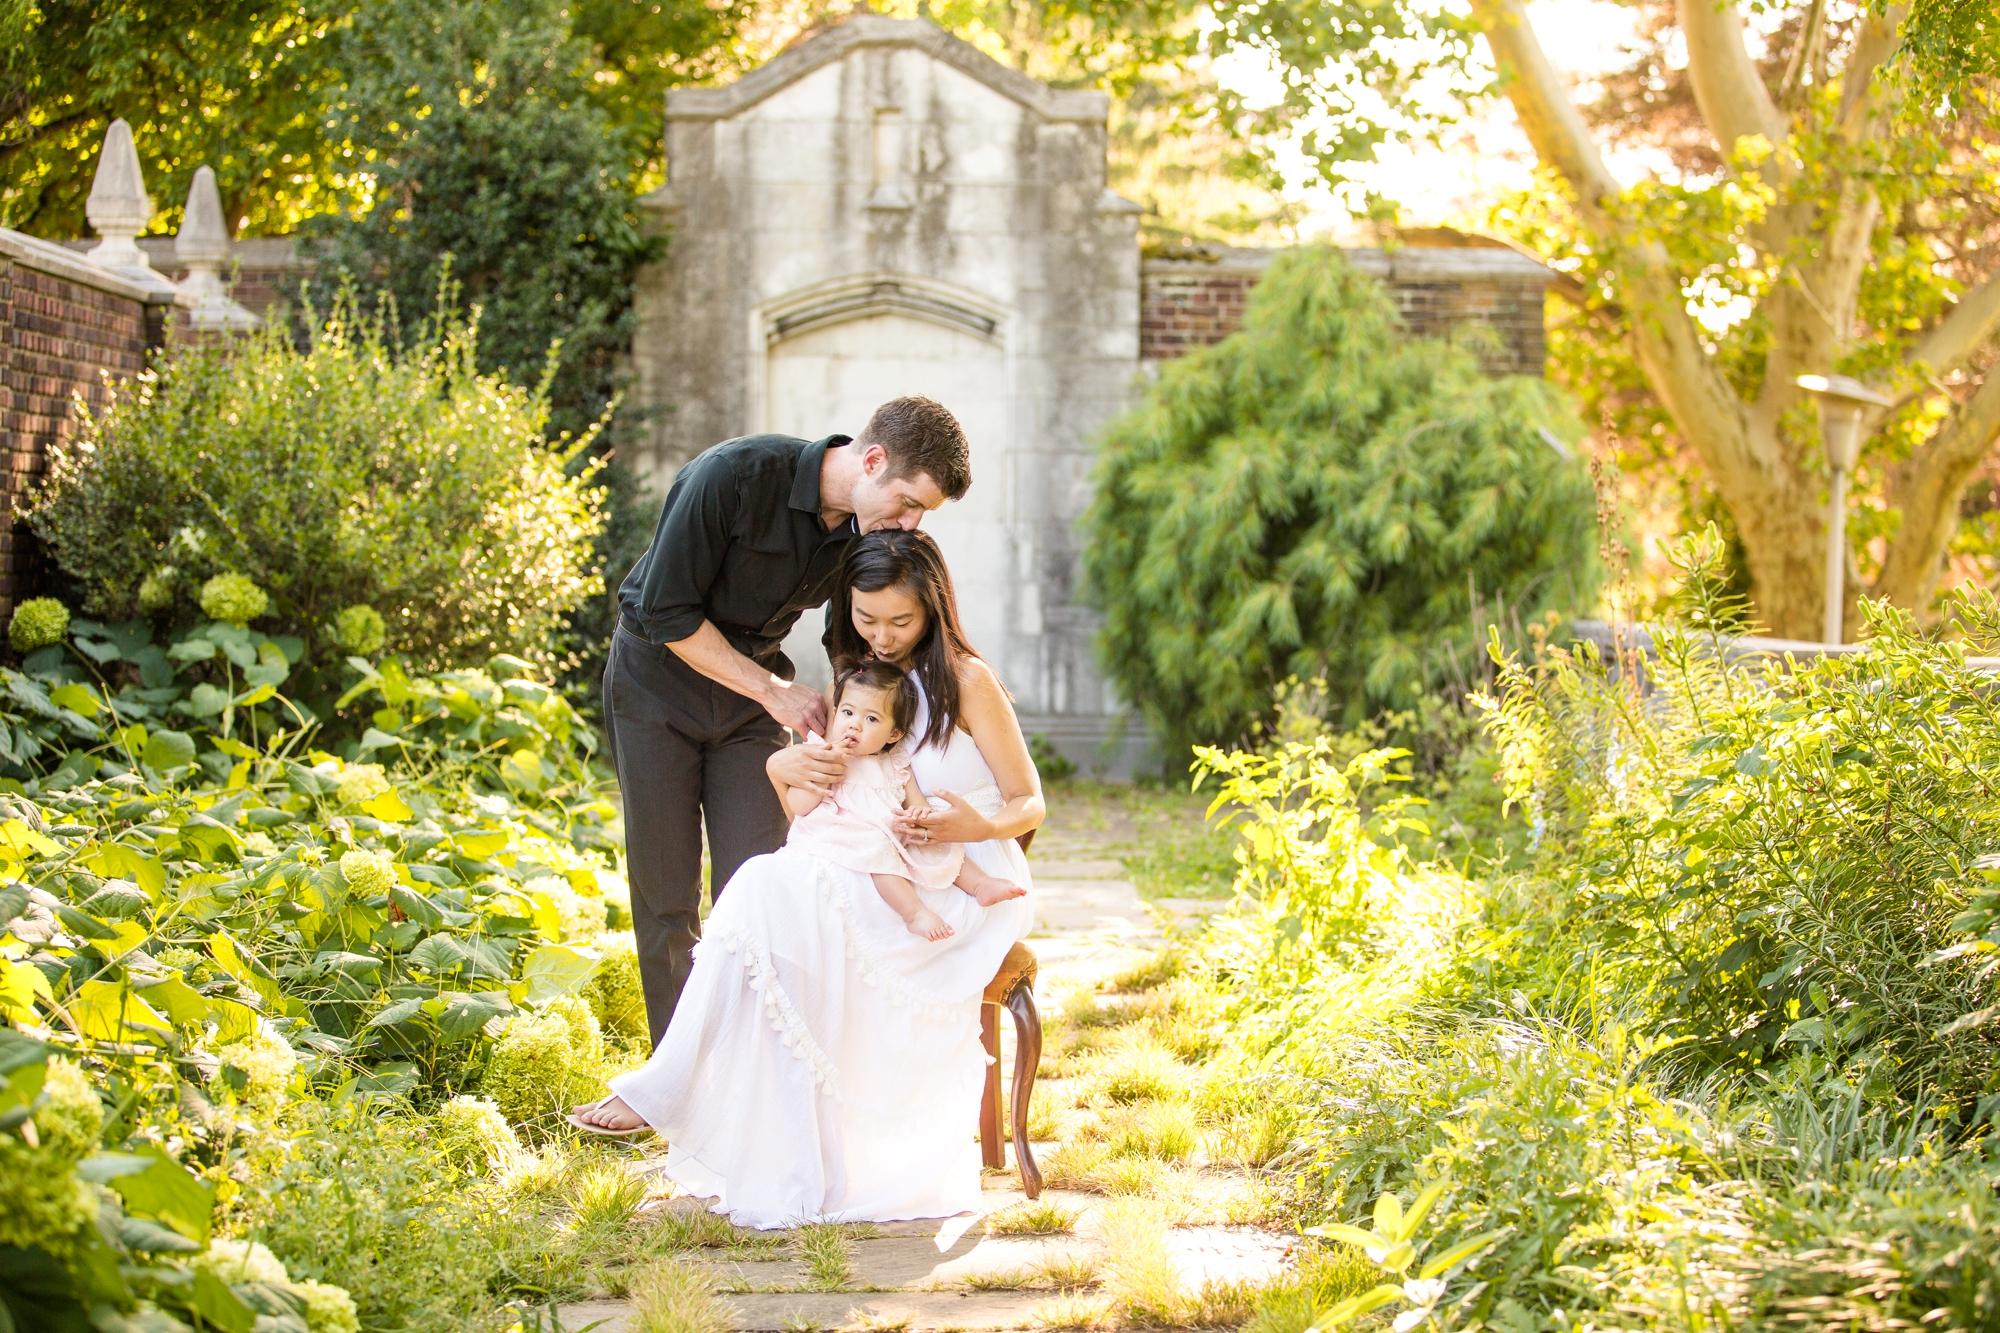 pittsburgh family photographer, cranberry township family photographer, wexford family photographer, mellon park family photos